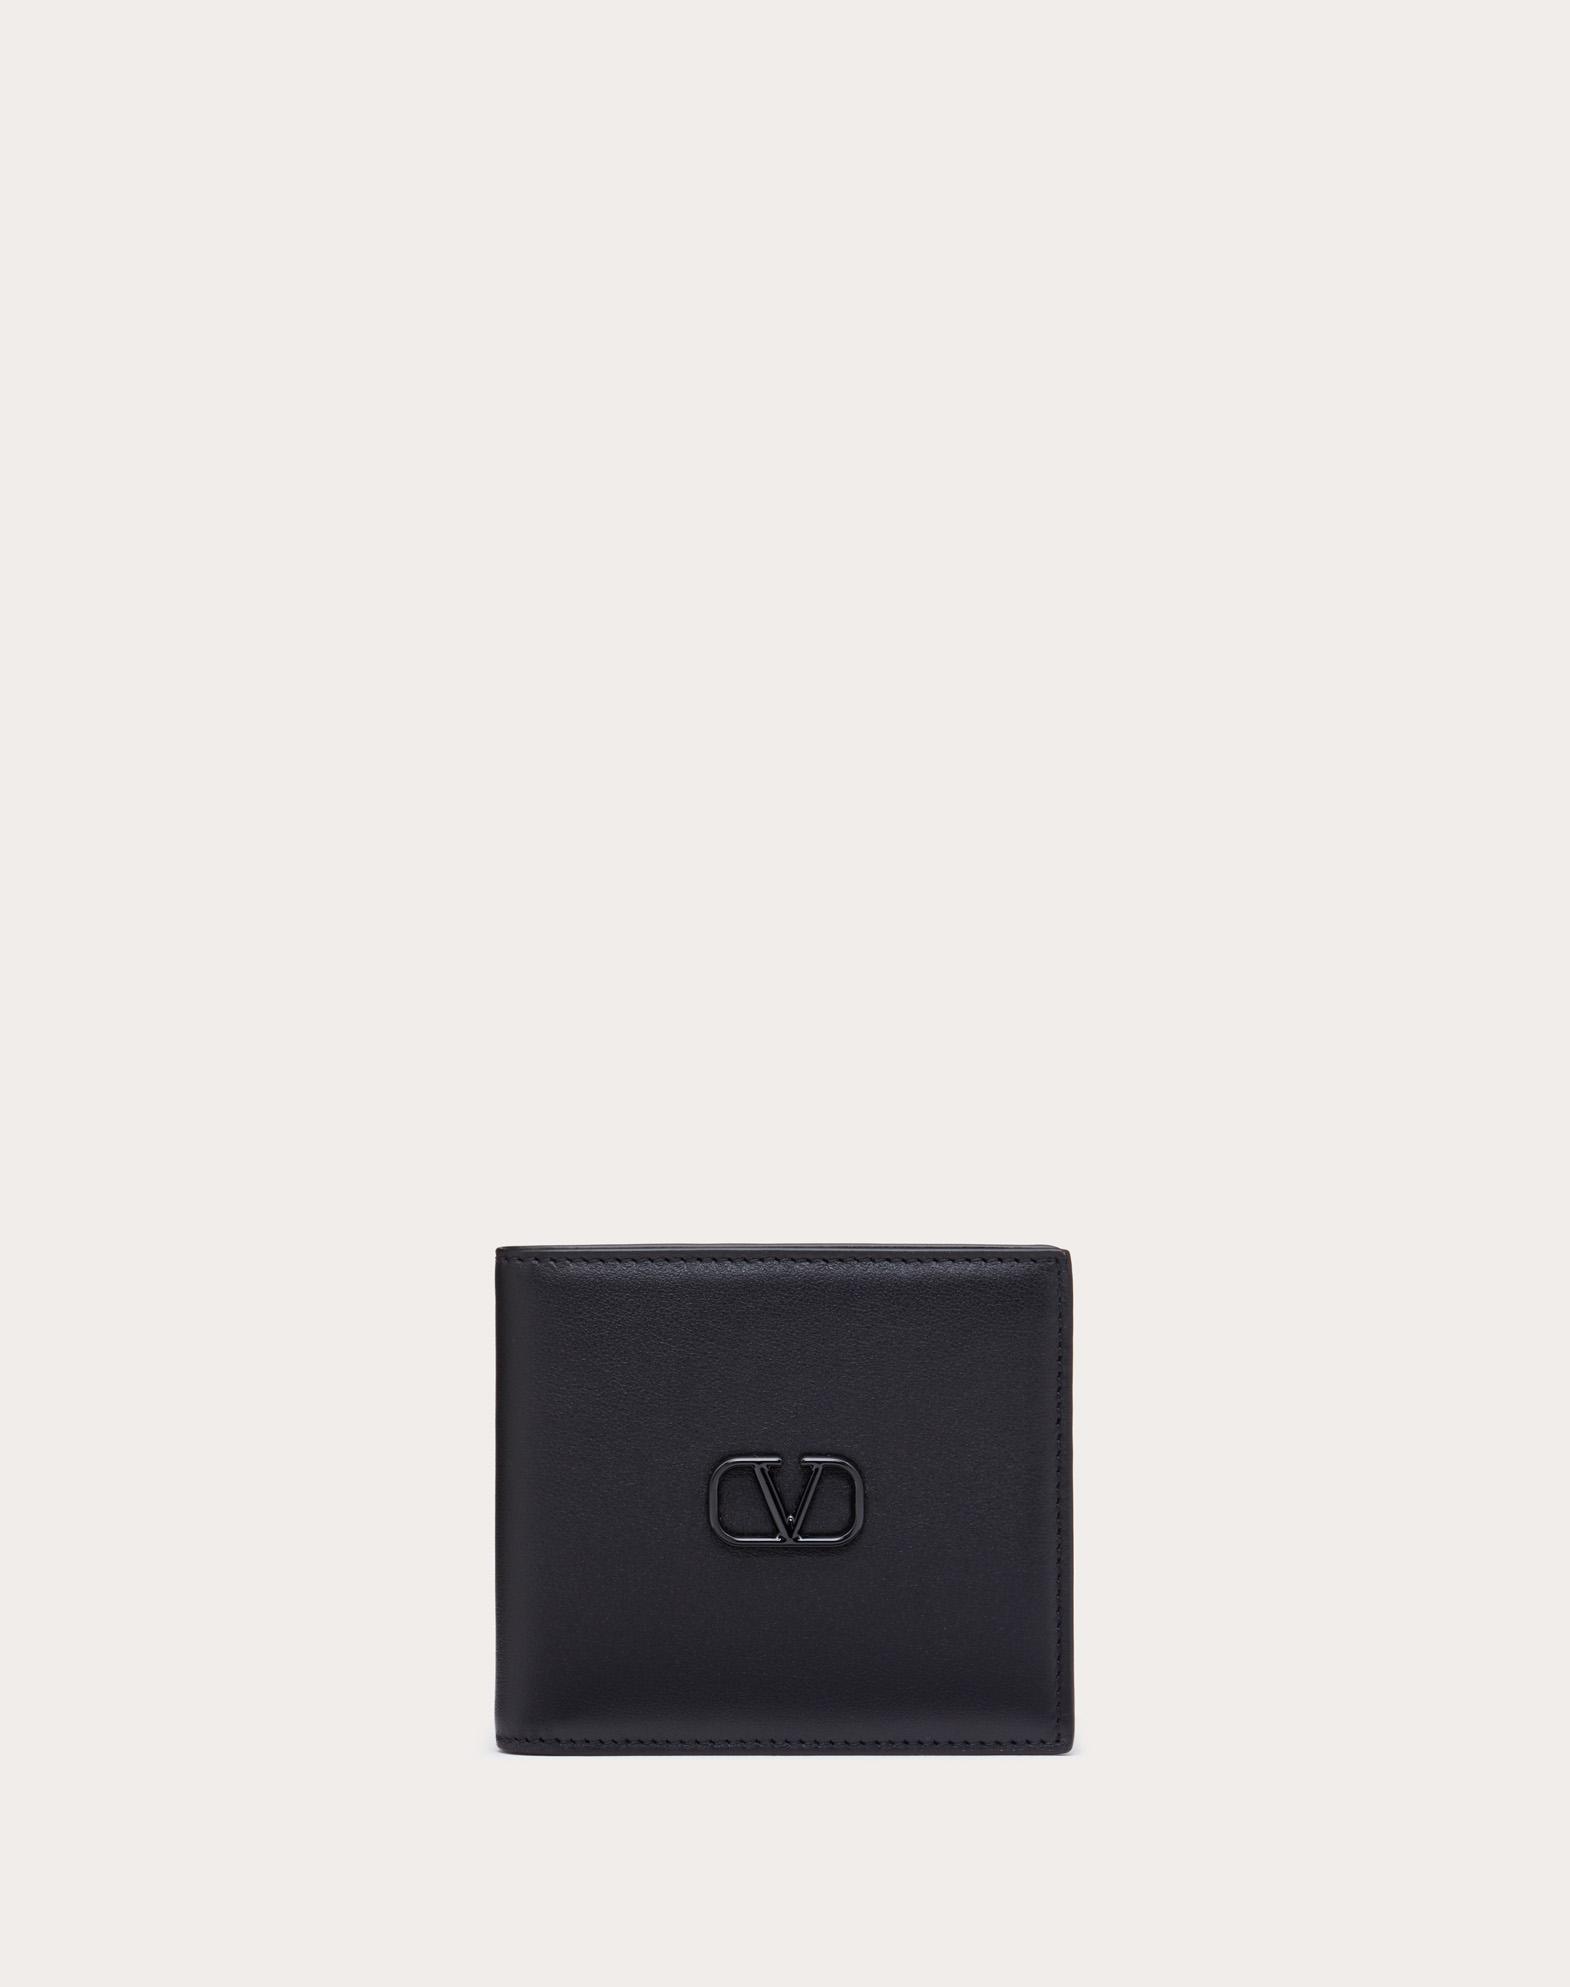 Leather VLOGO wallet